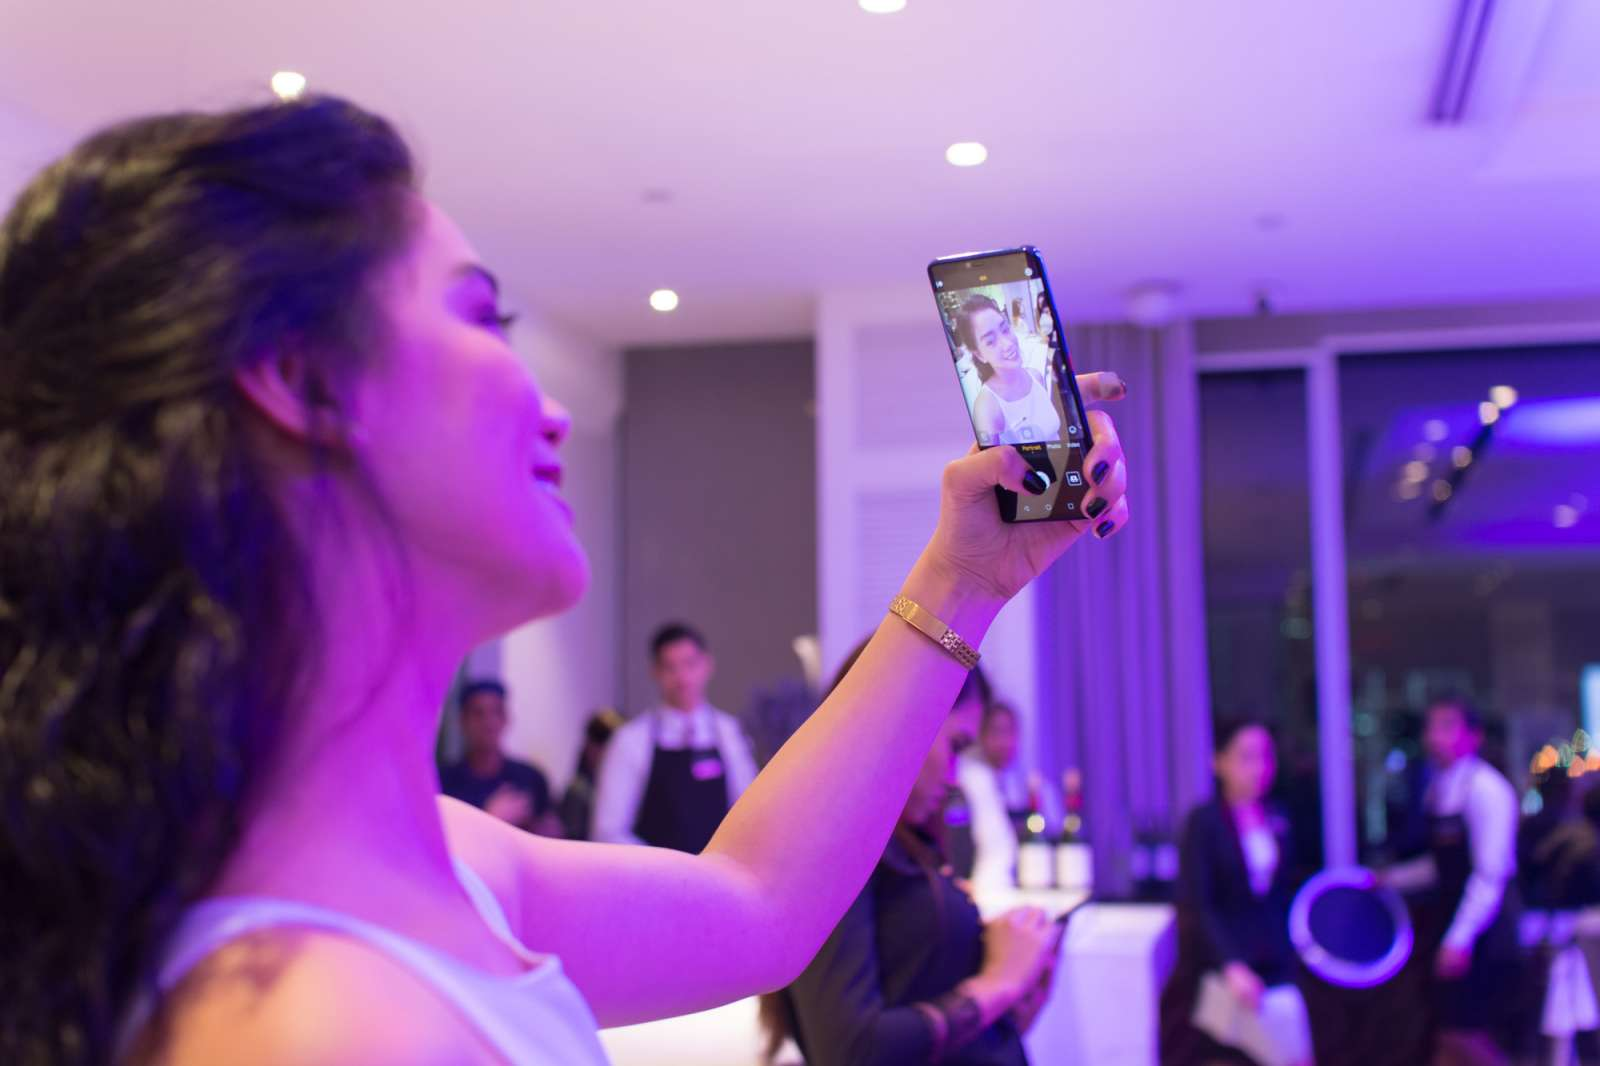 Huawei Mate 20 Pro - selfie